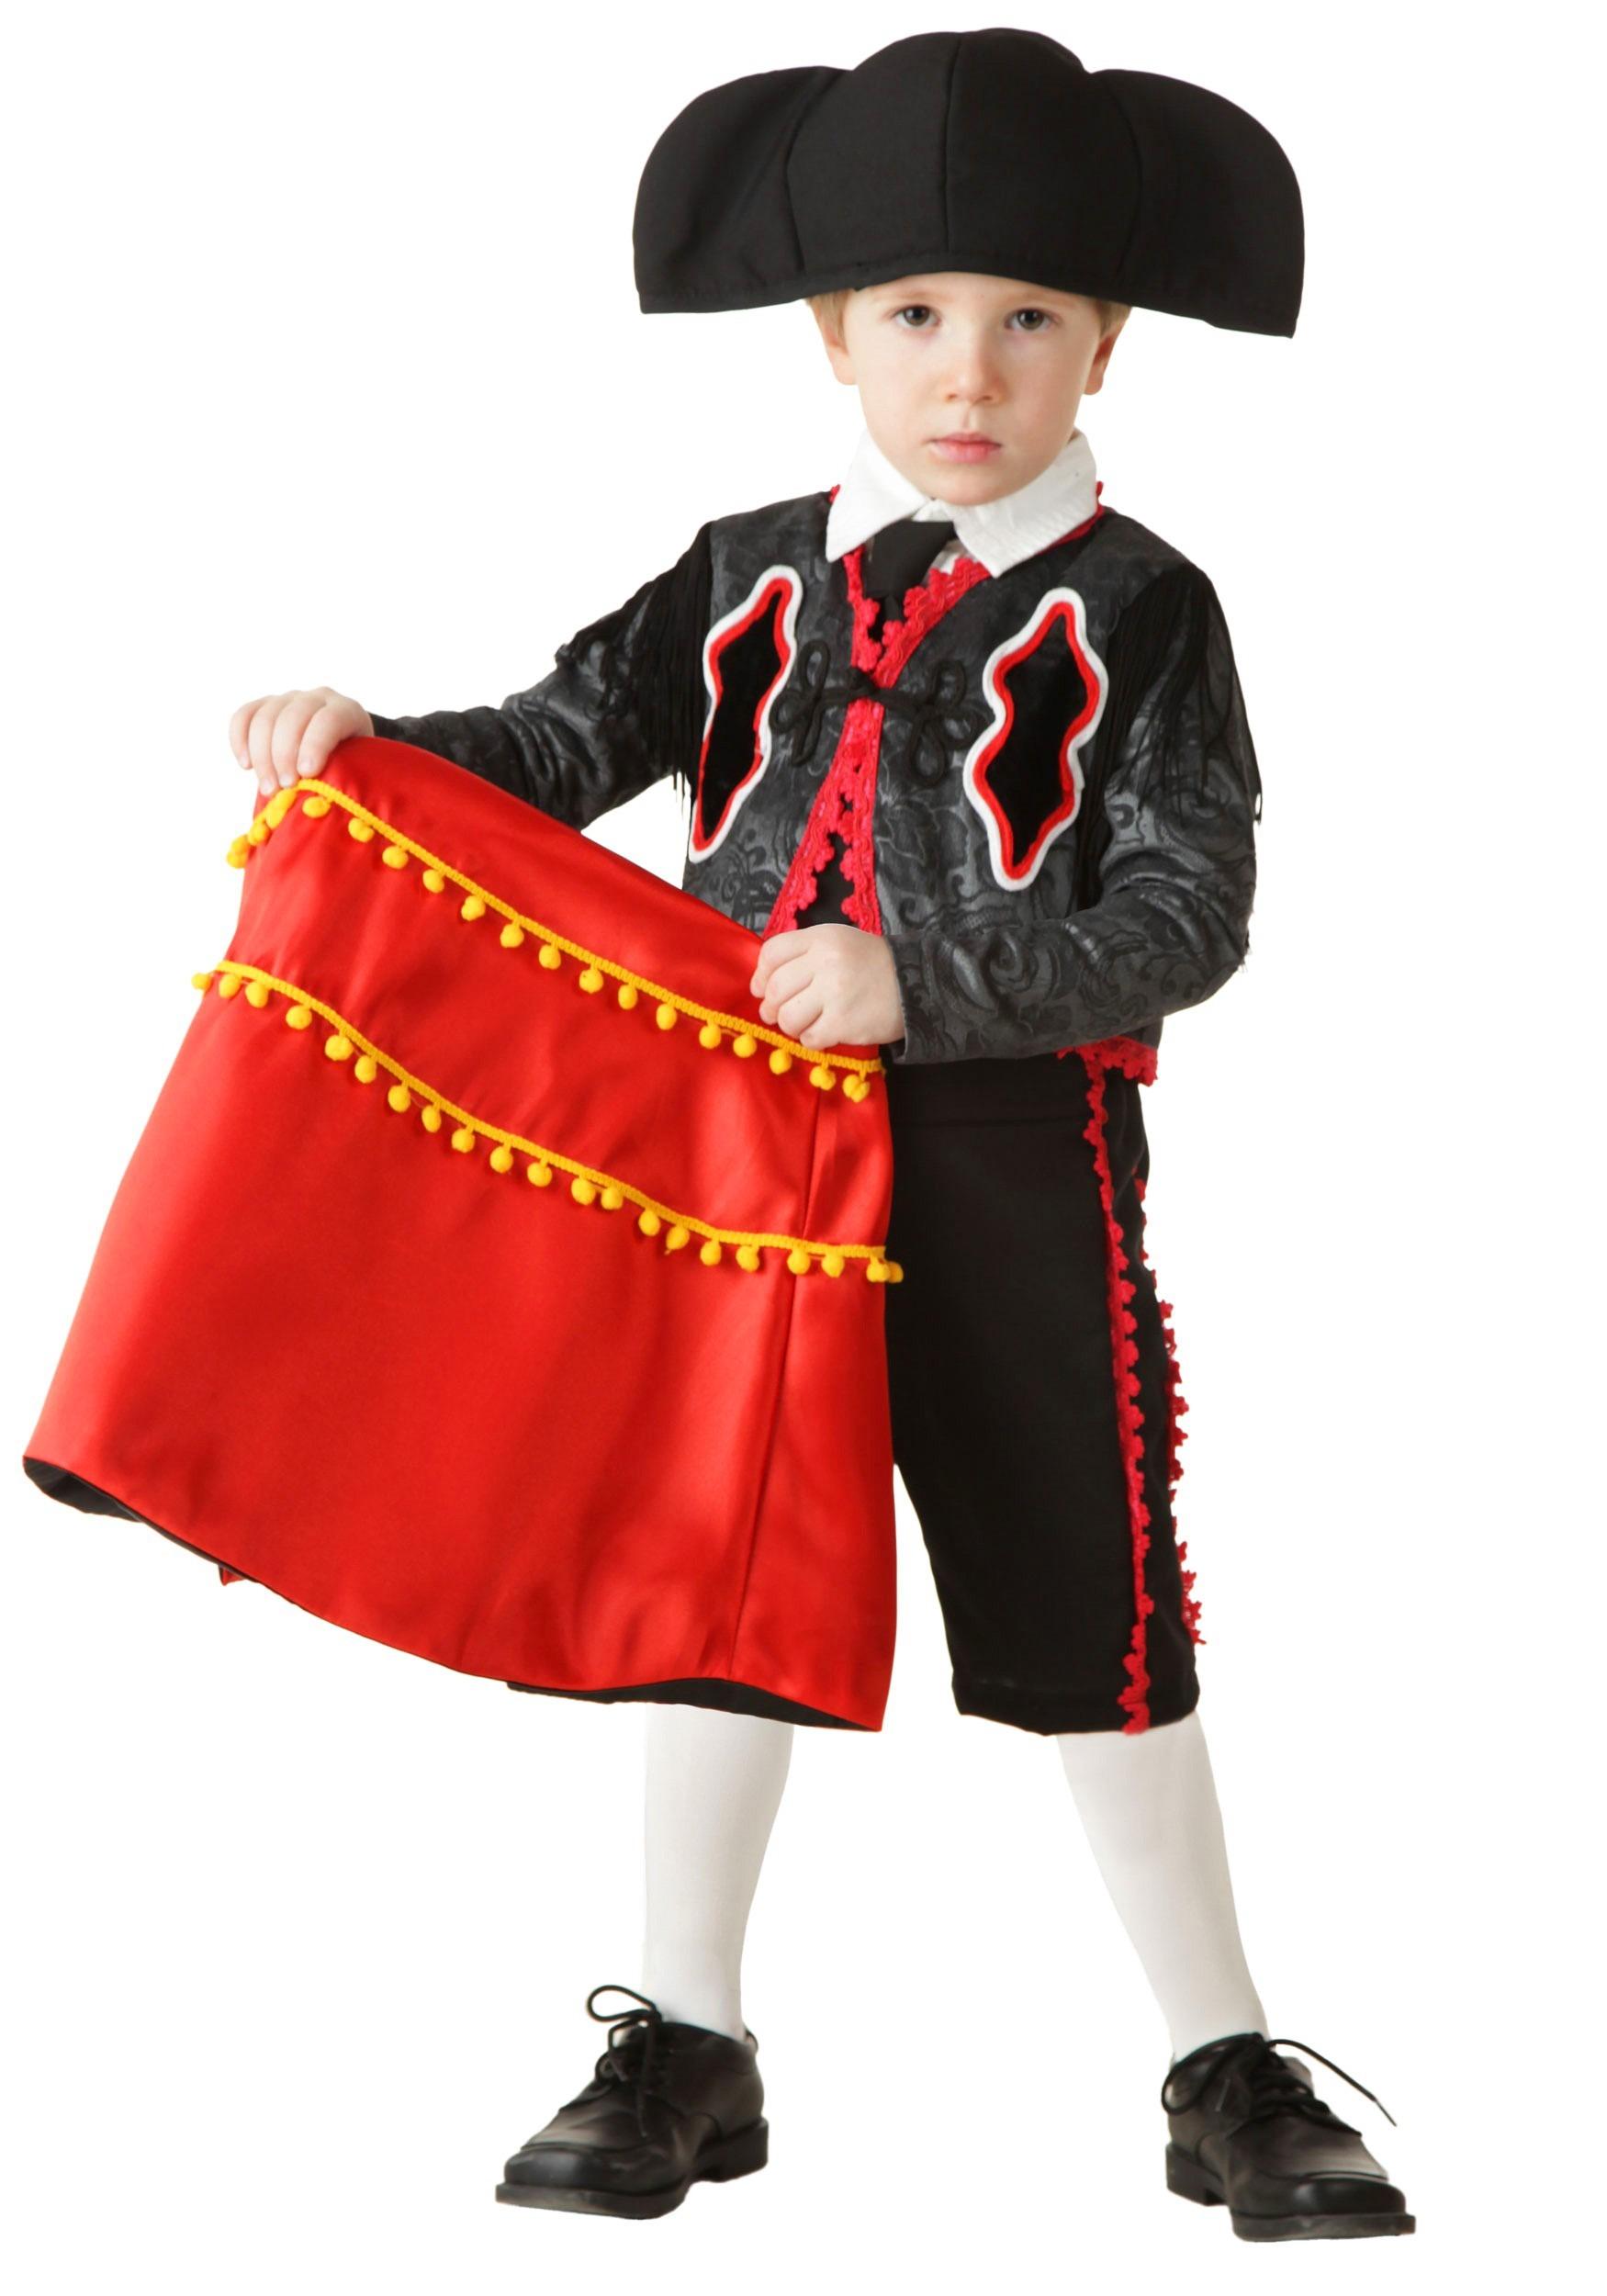 Spanish Costume Hat Bull Fighting Matador Dress Up Hats Funny Party